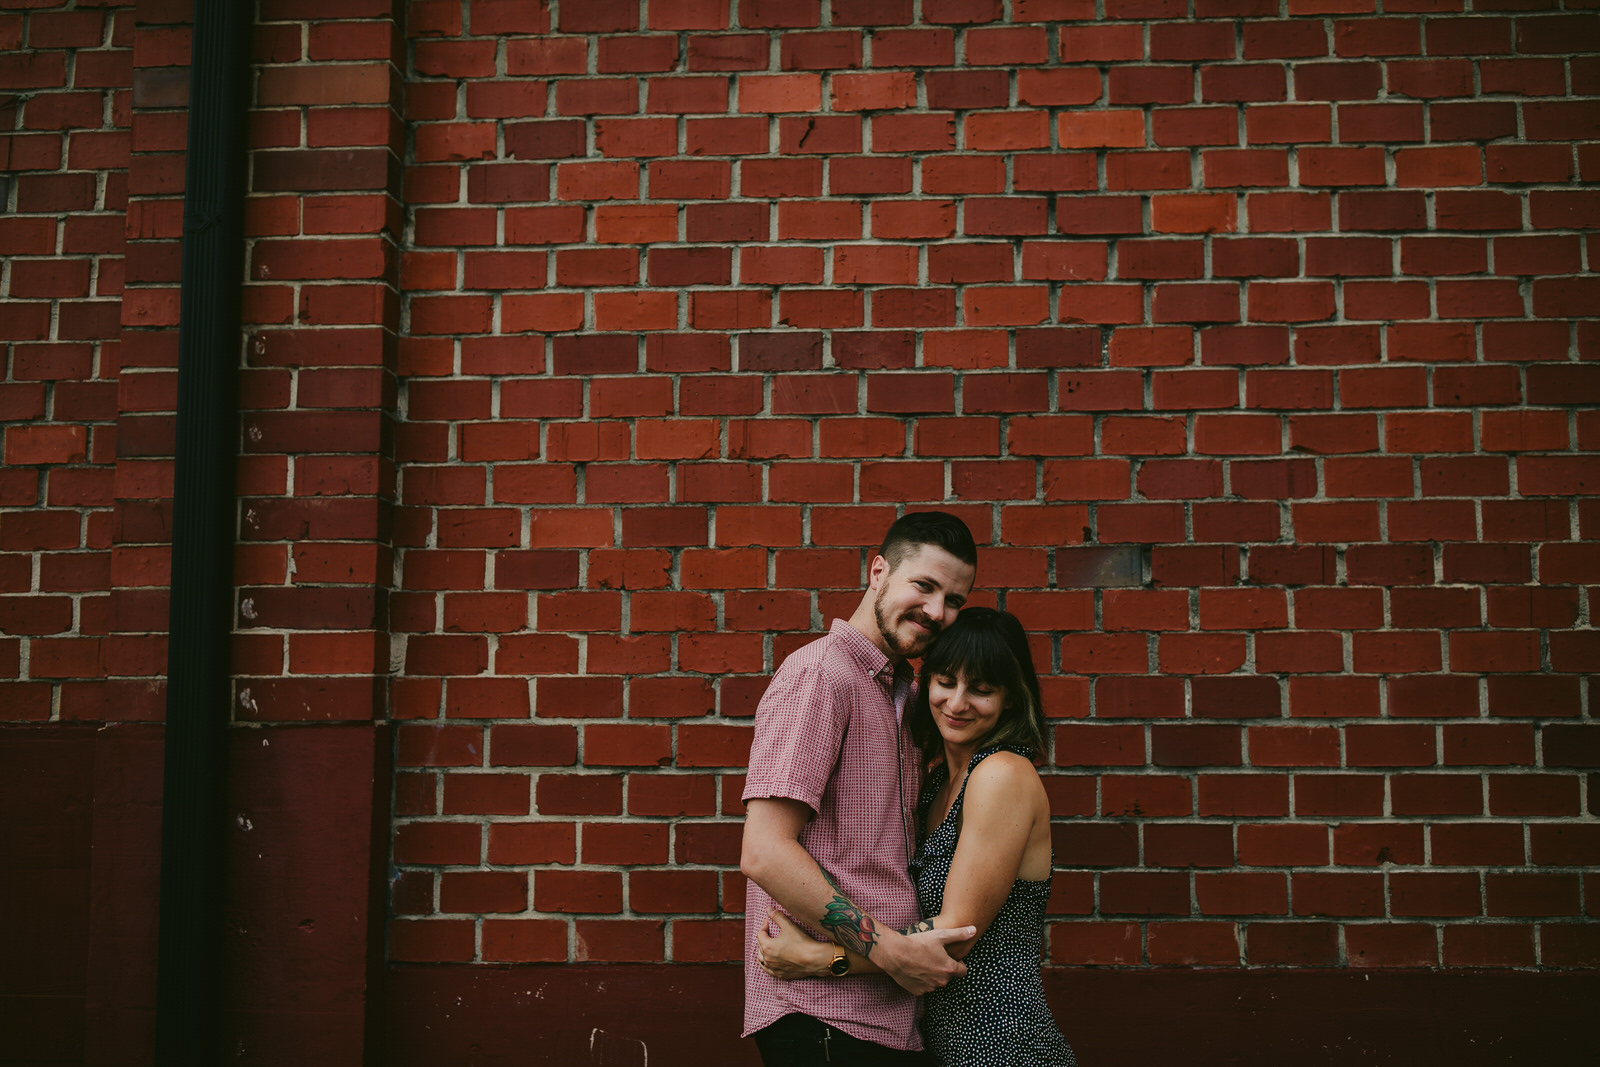 south-florida-couples-photographer-tiny-house-photo-jacksonville-portraits.jpg